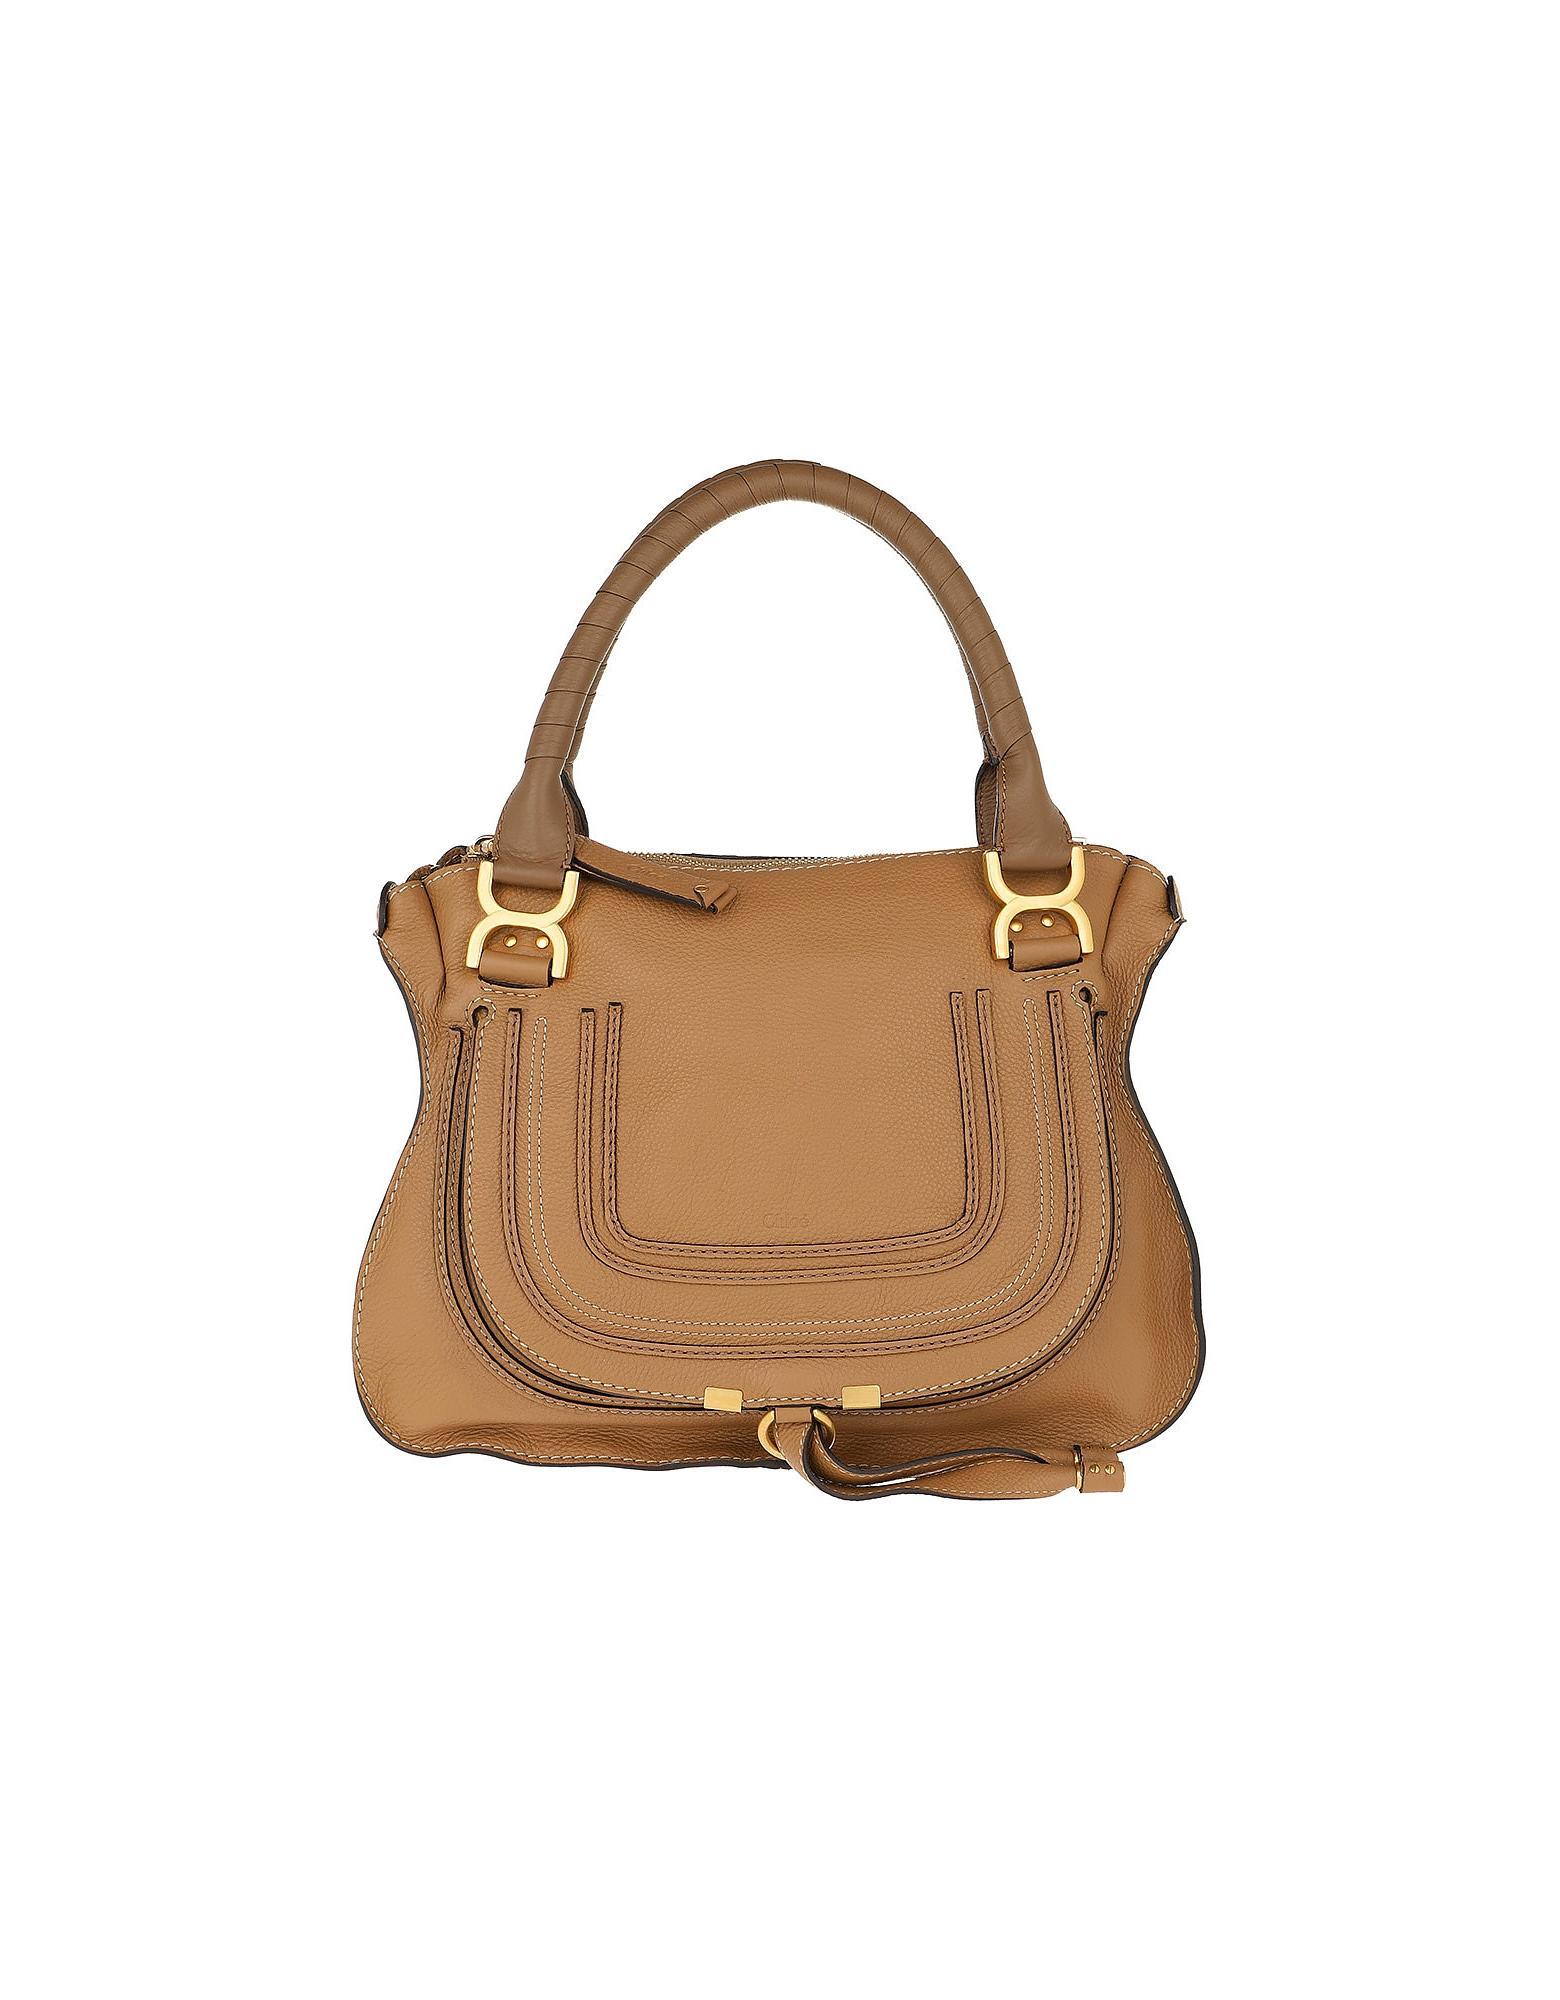 f42498661af6a Lyst - Chloé Marcie Medium Shoulder Bag Nut in Brown